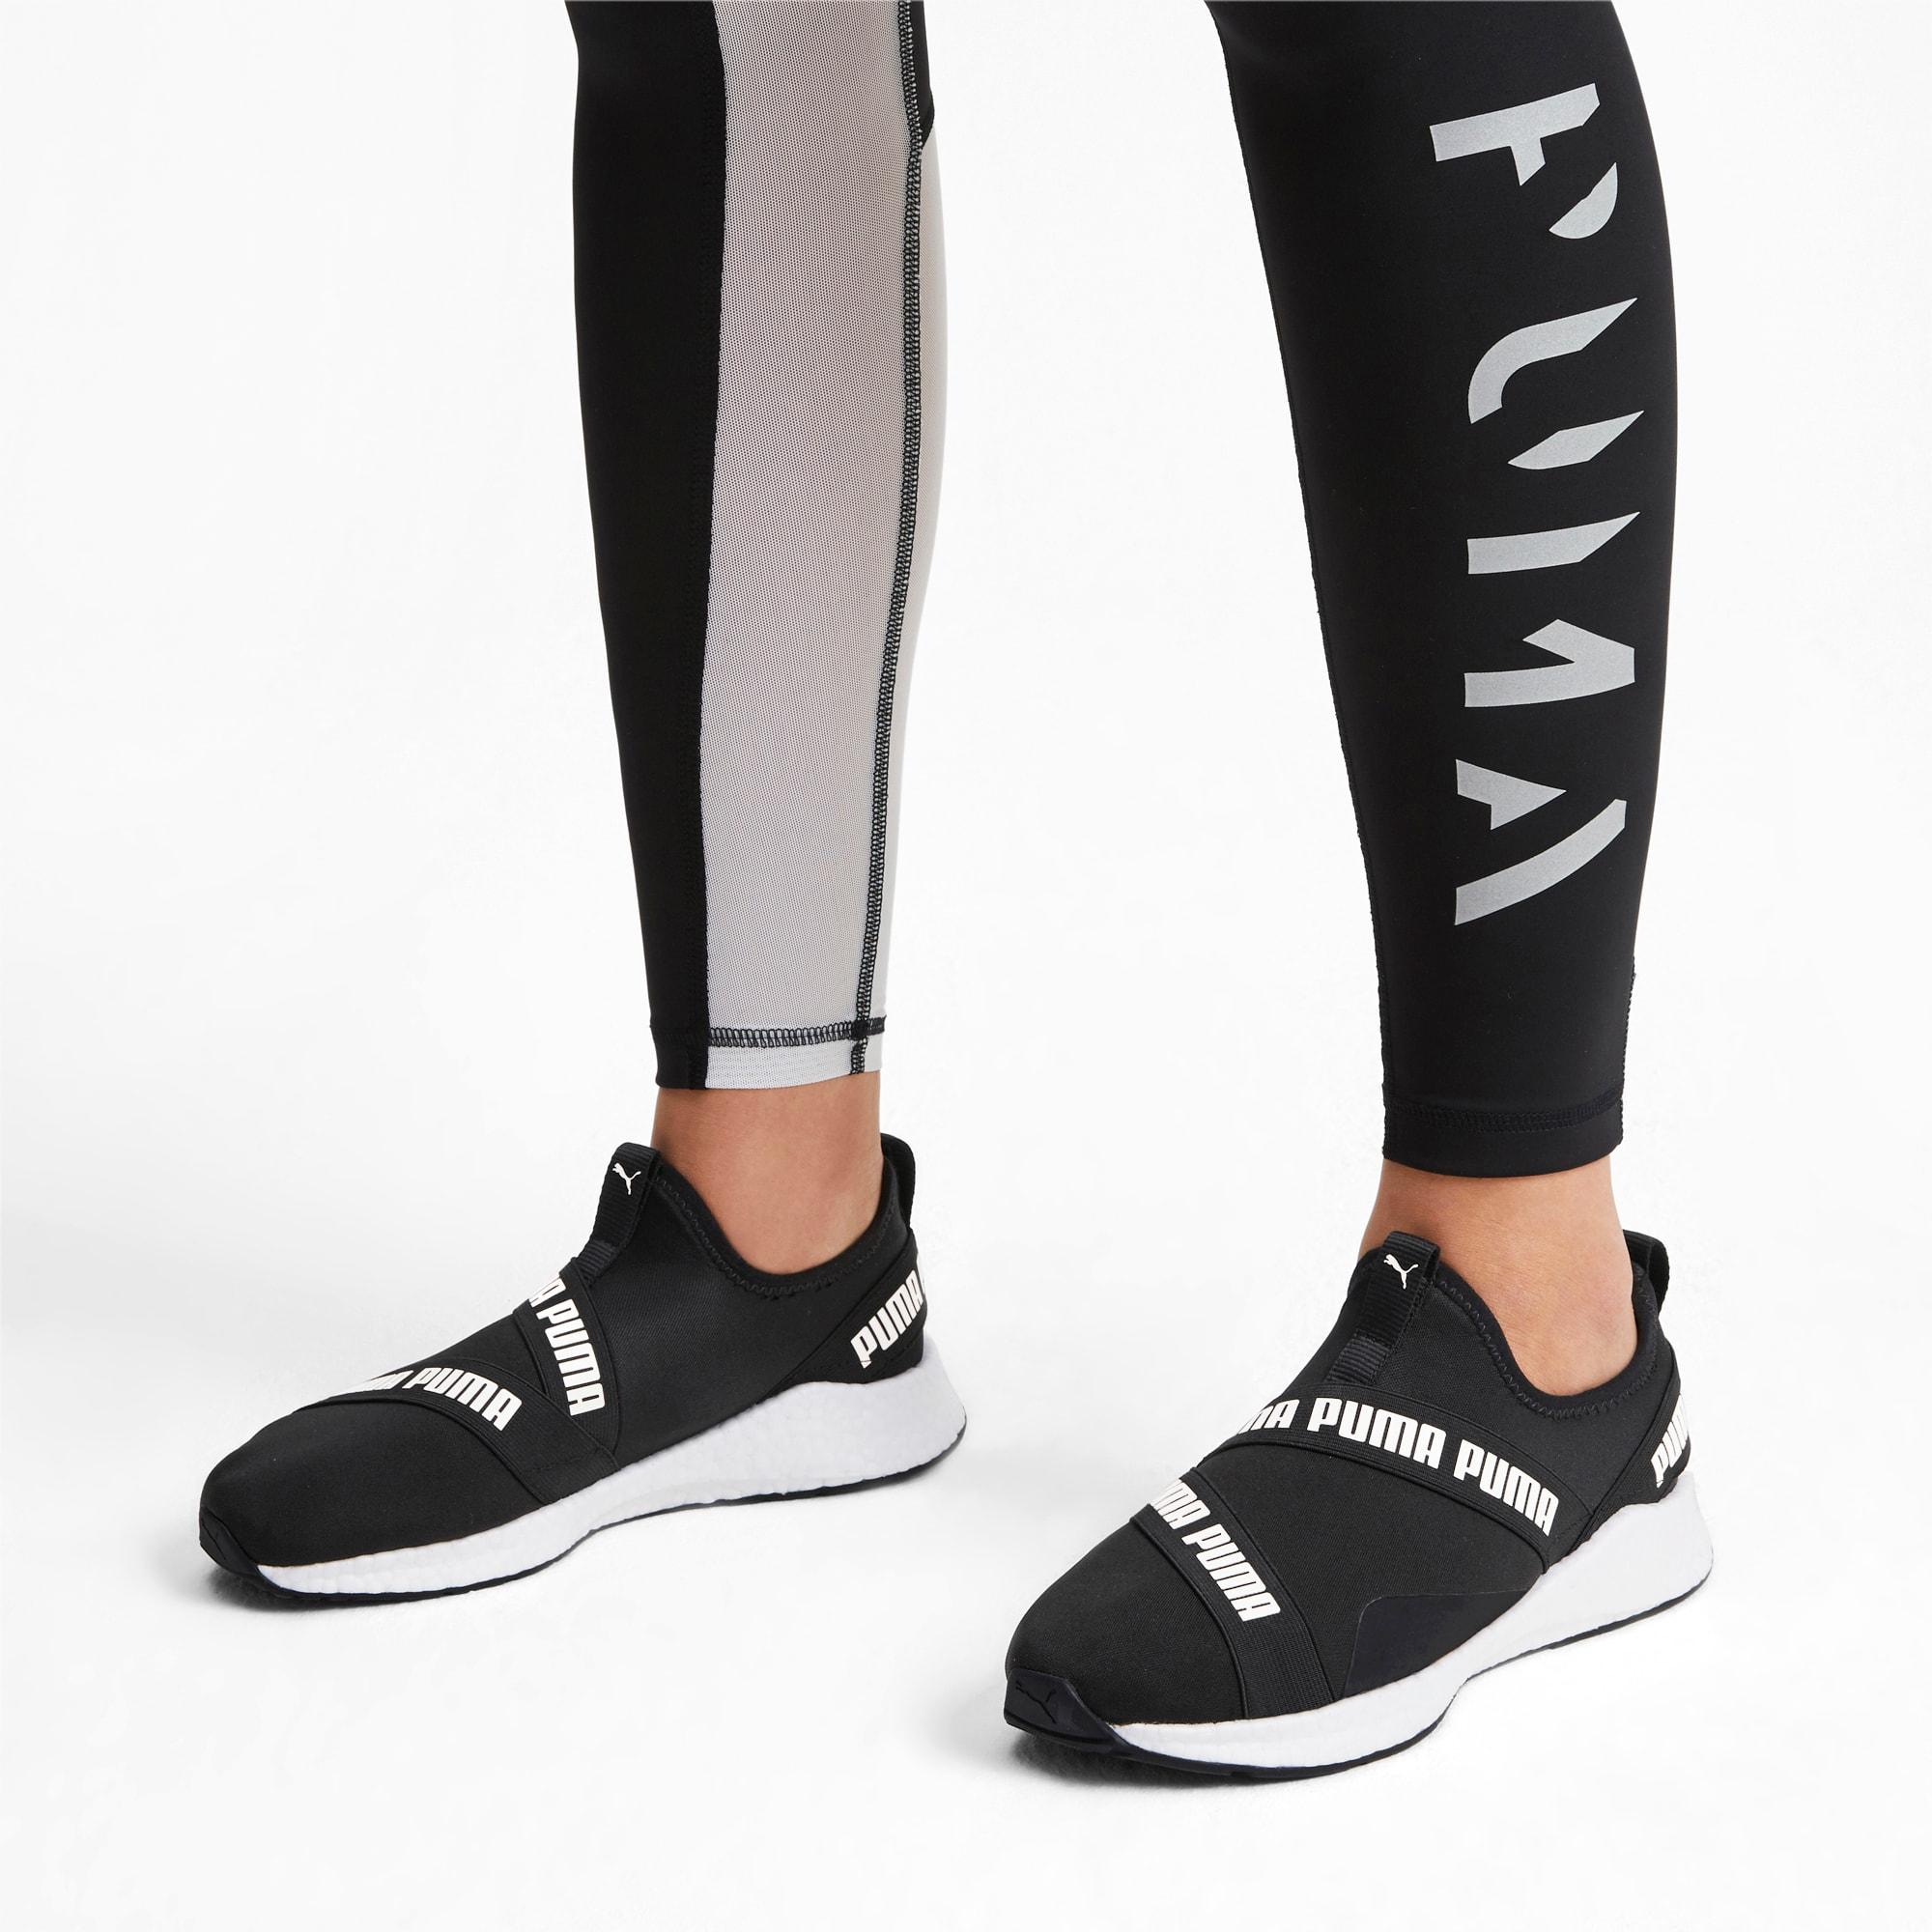 Zapatos sin cordones NRGY Star de hombre para correr